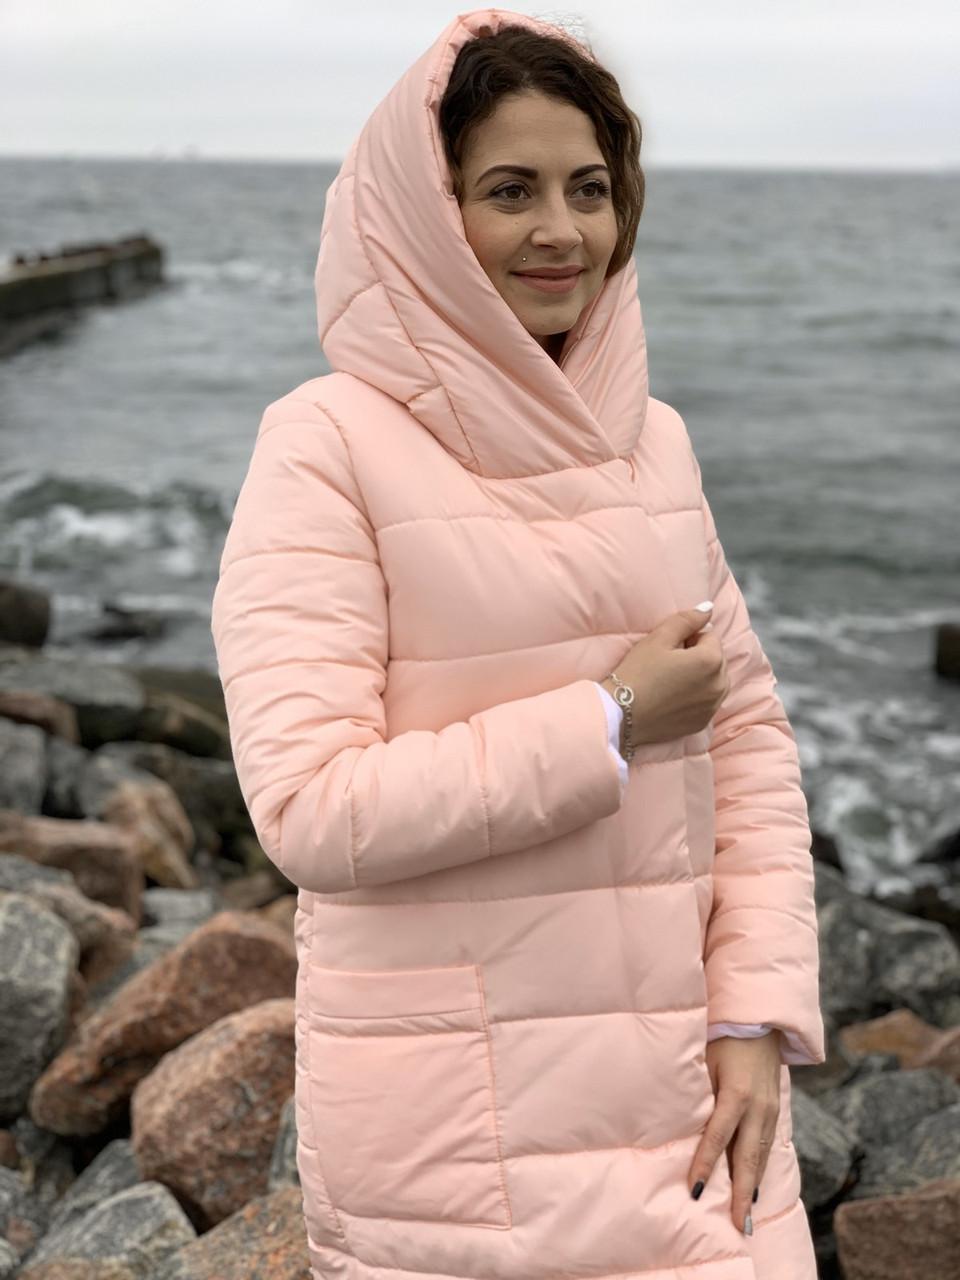 М032 Теплое зимнее пальто,пудра, ткань плащевка